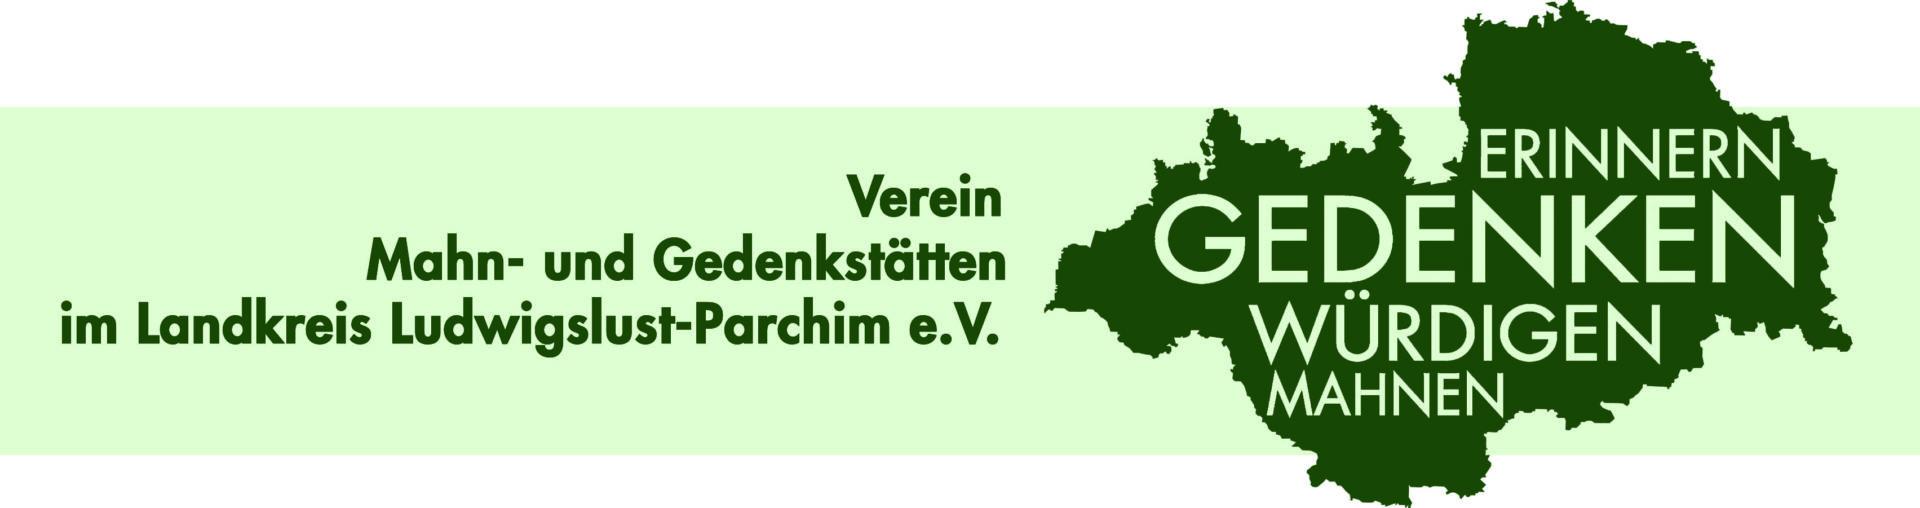 Mahn und Gedenkstätten Wöbbelin Logo